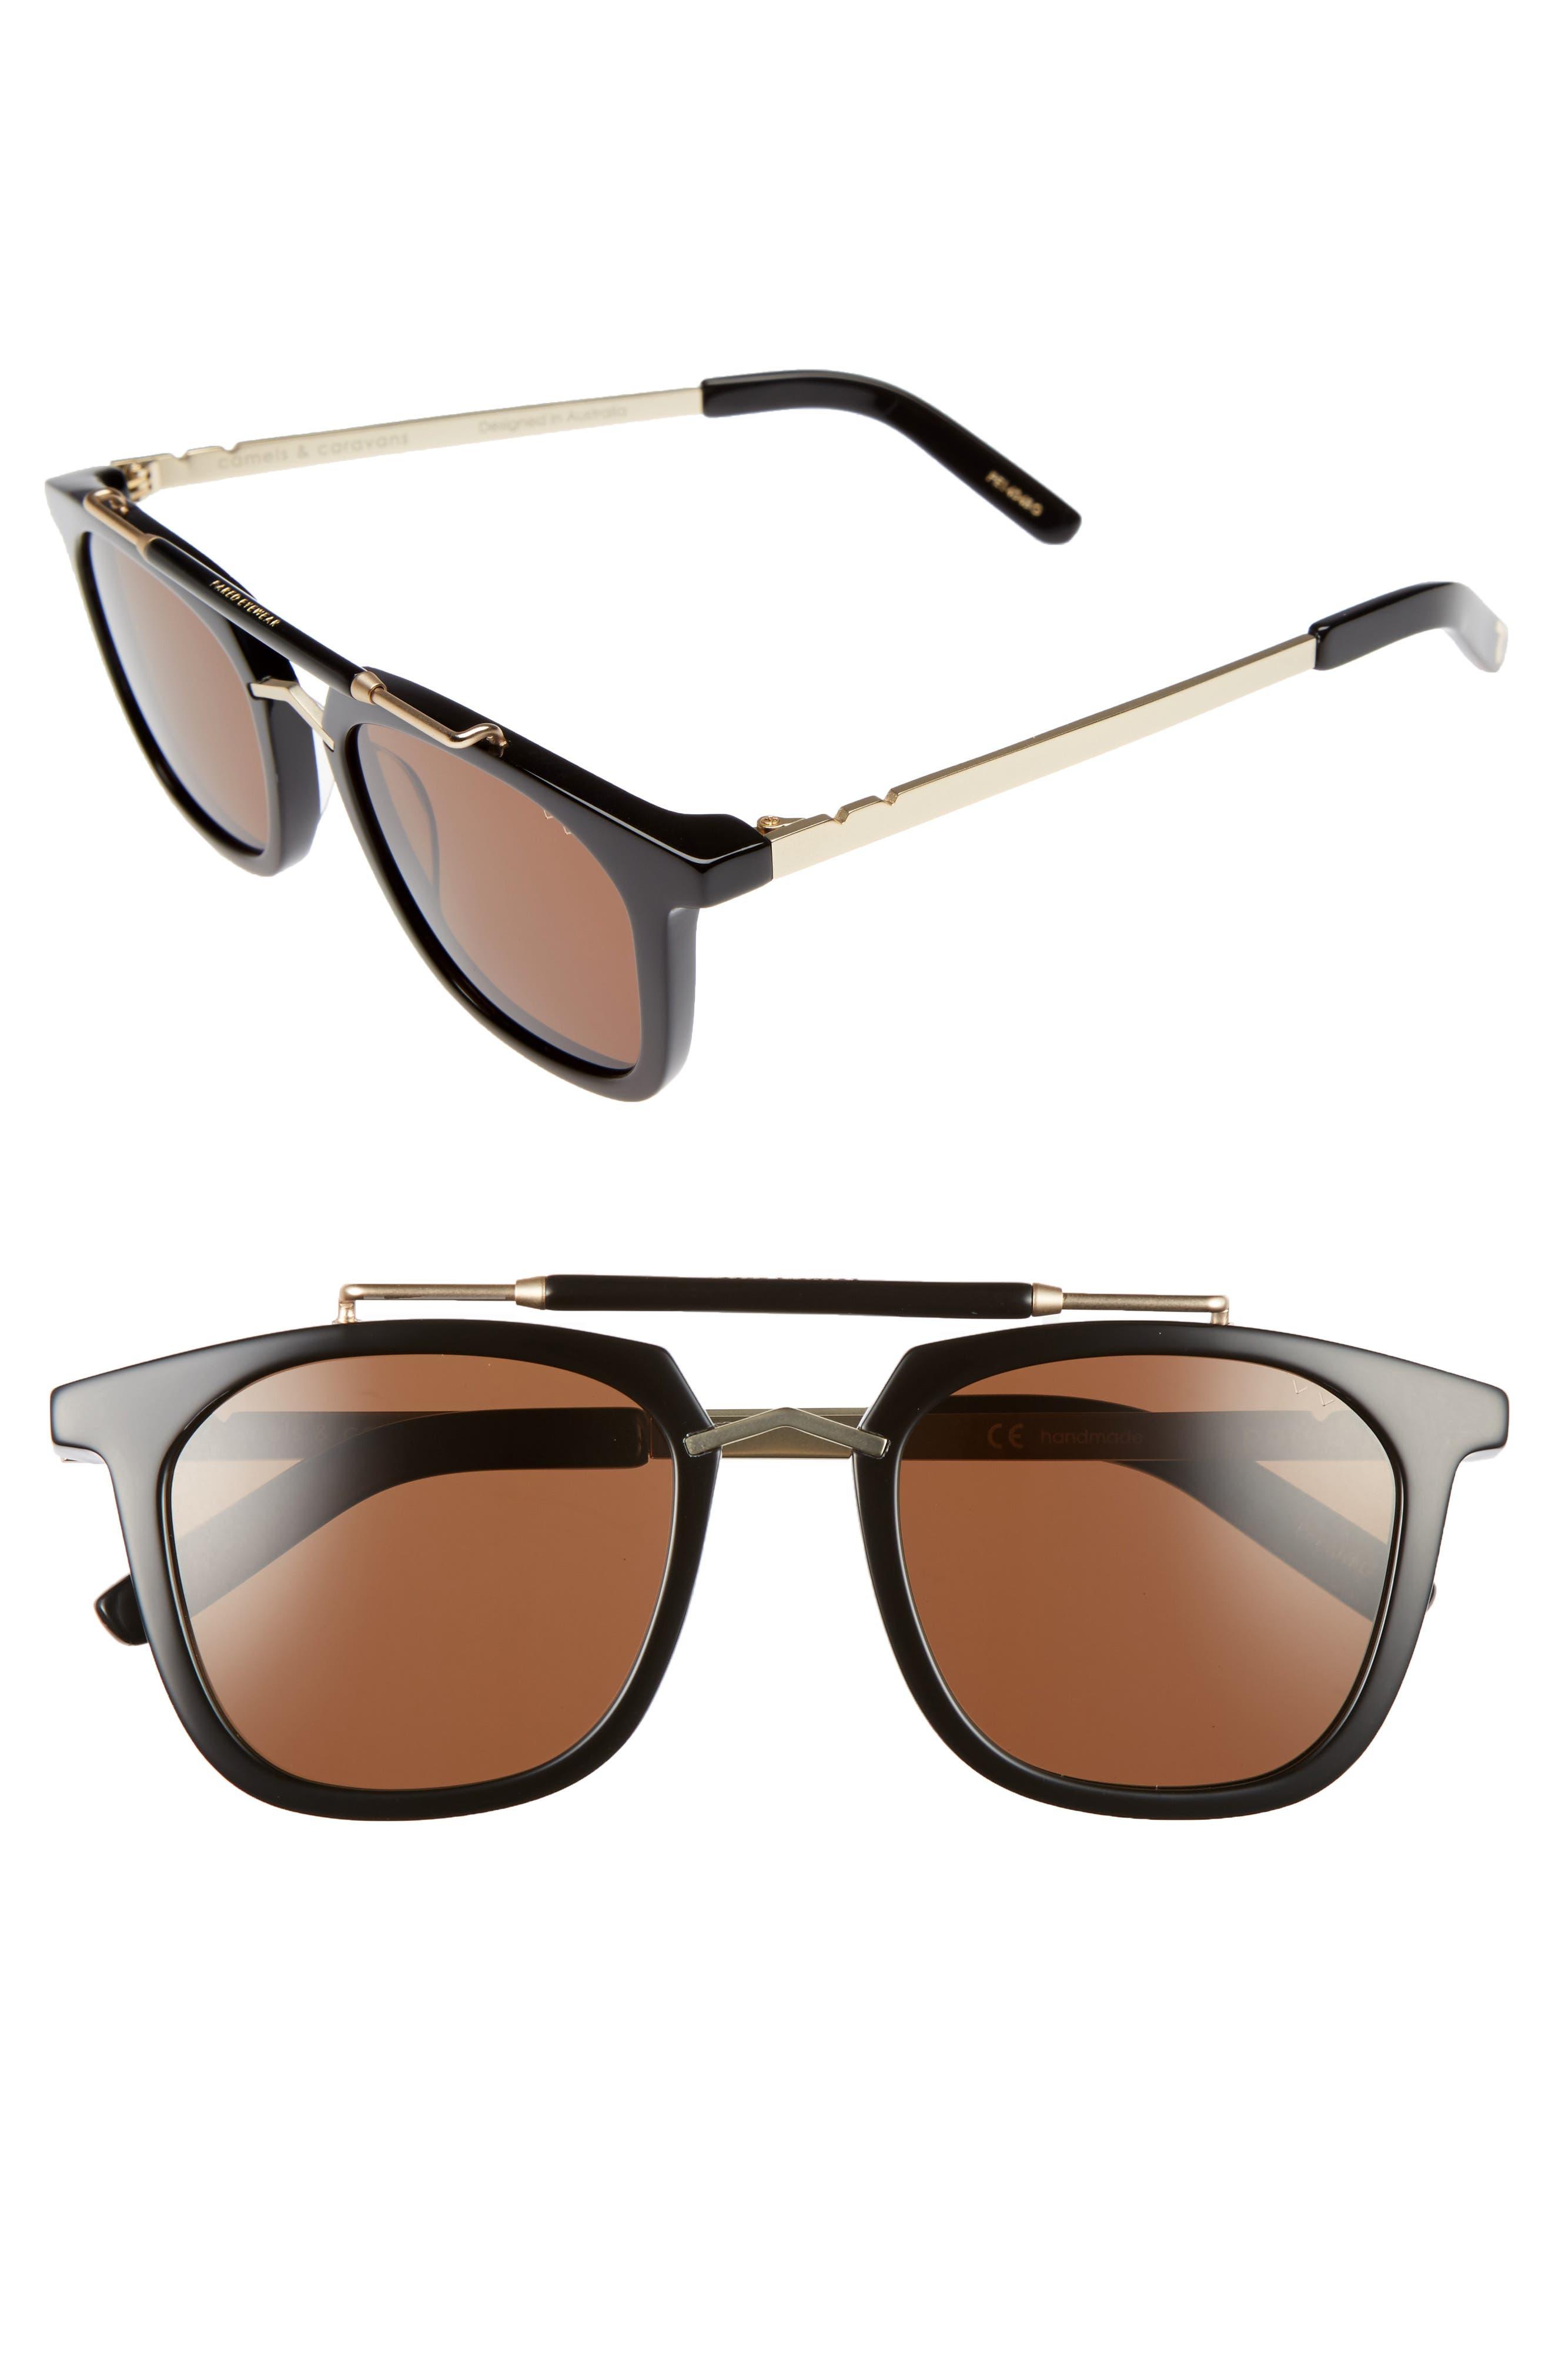 Main Image - Pared Camels & Caravans 50mm Retro Sunglasses